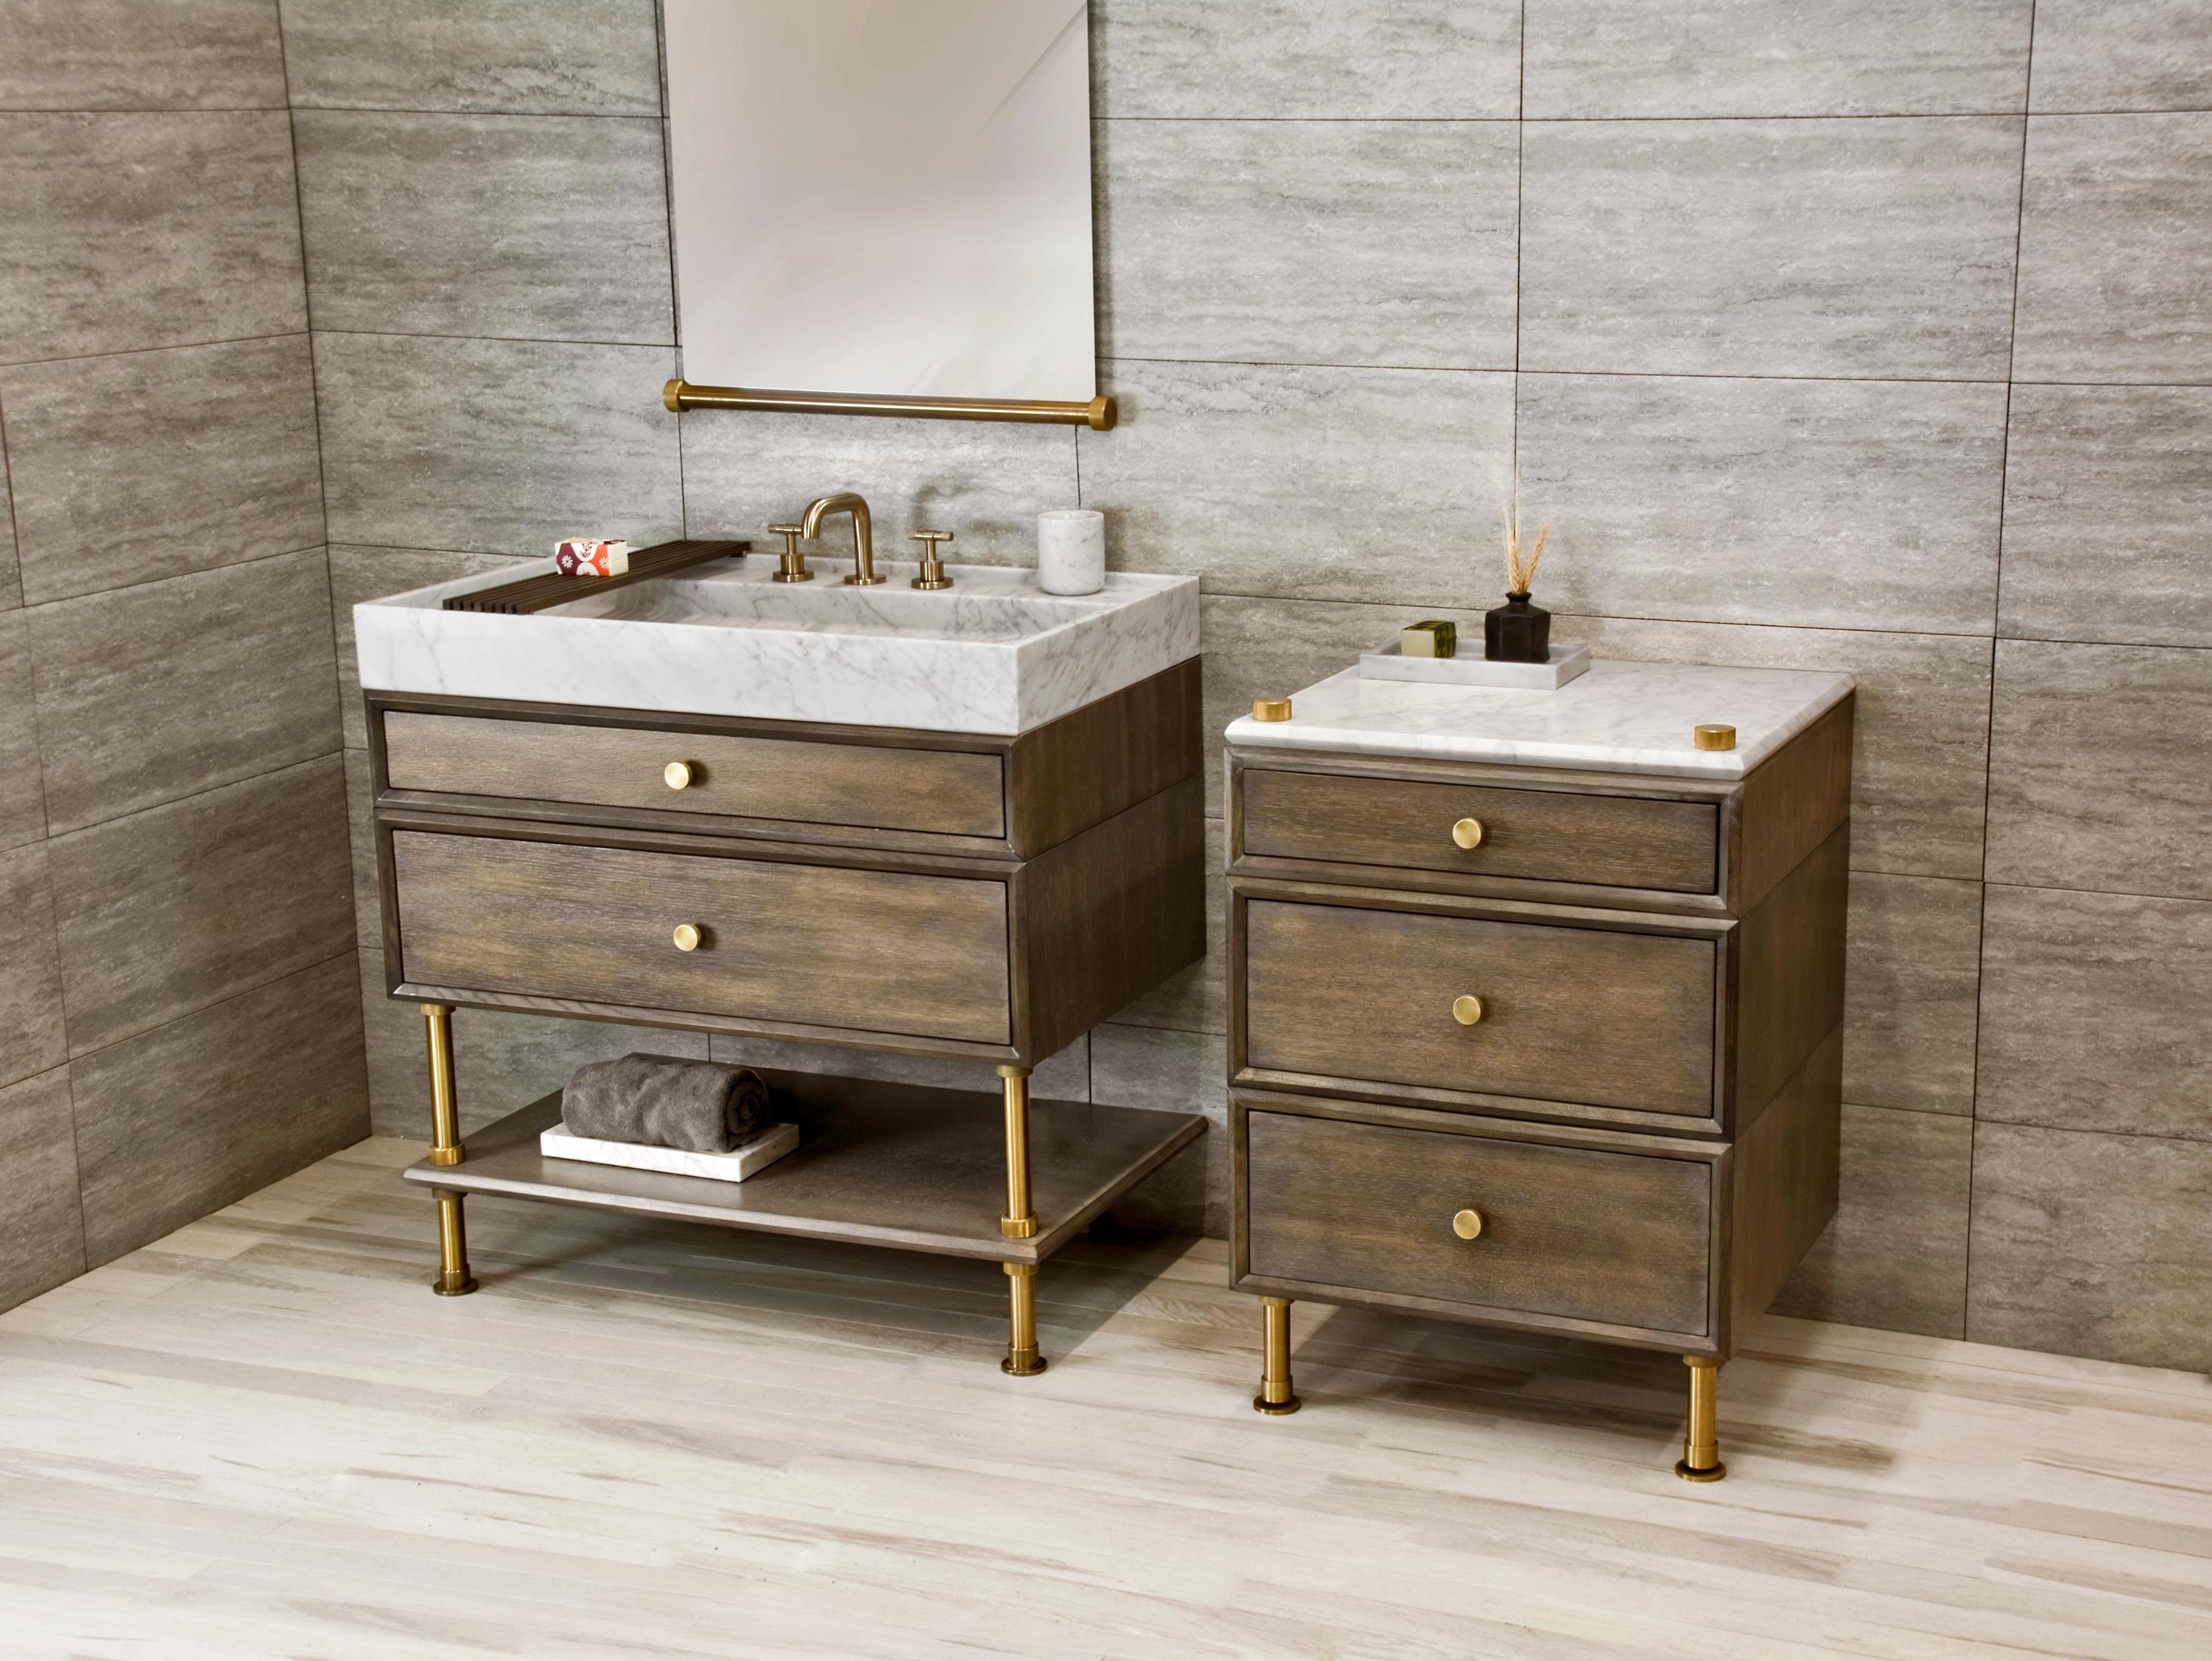 Ventus Bath Vanity with Split Drawers &